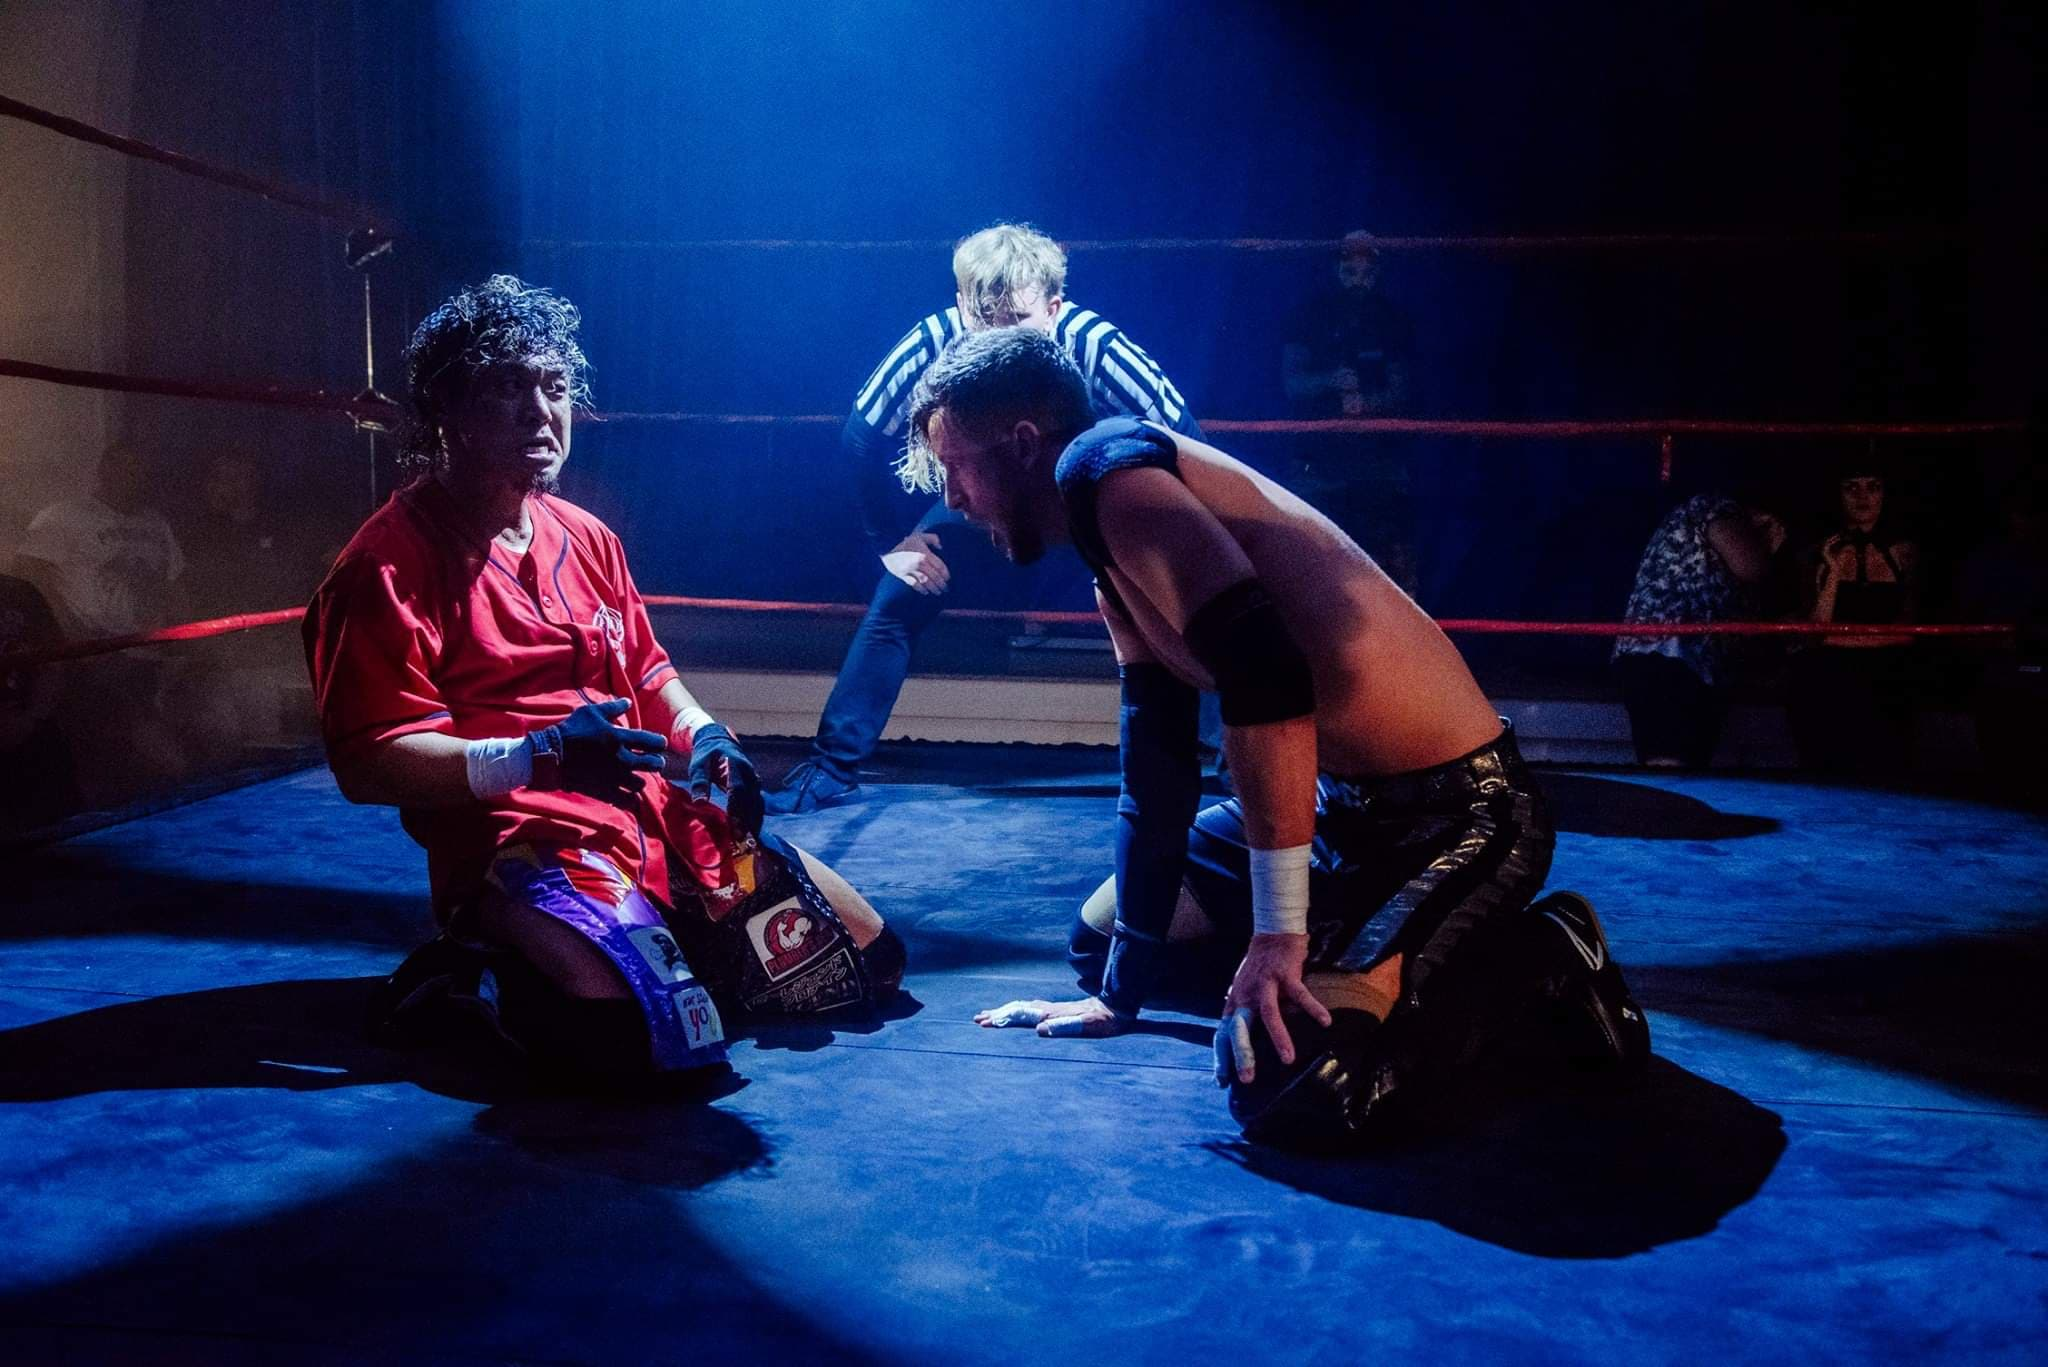 Tanizaki and Chris Brookes battled at International Waters 2018 (photo: The Head Drop)